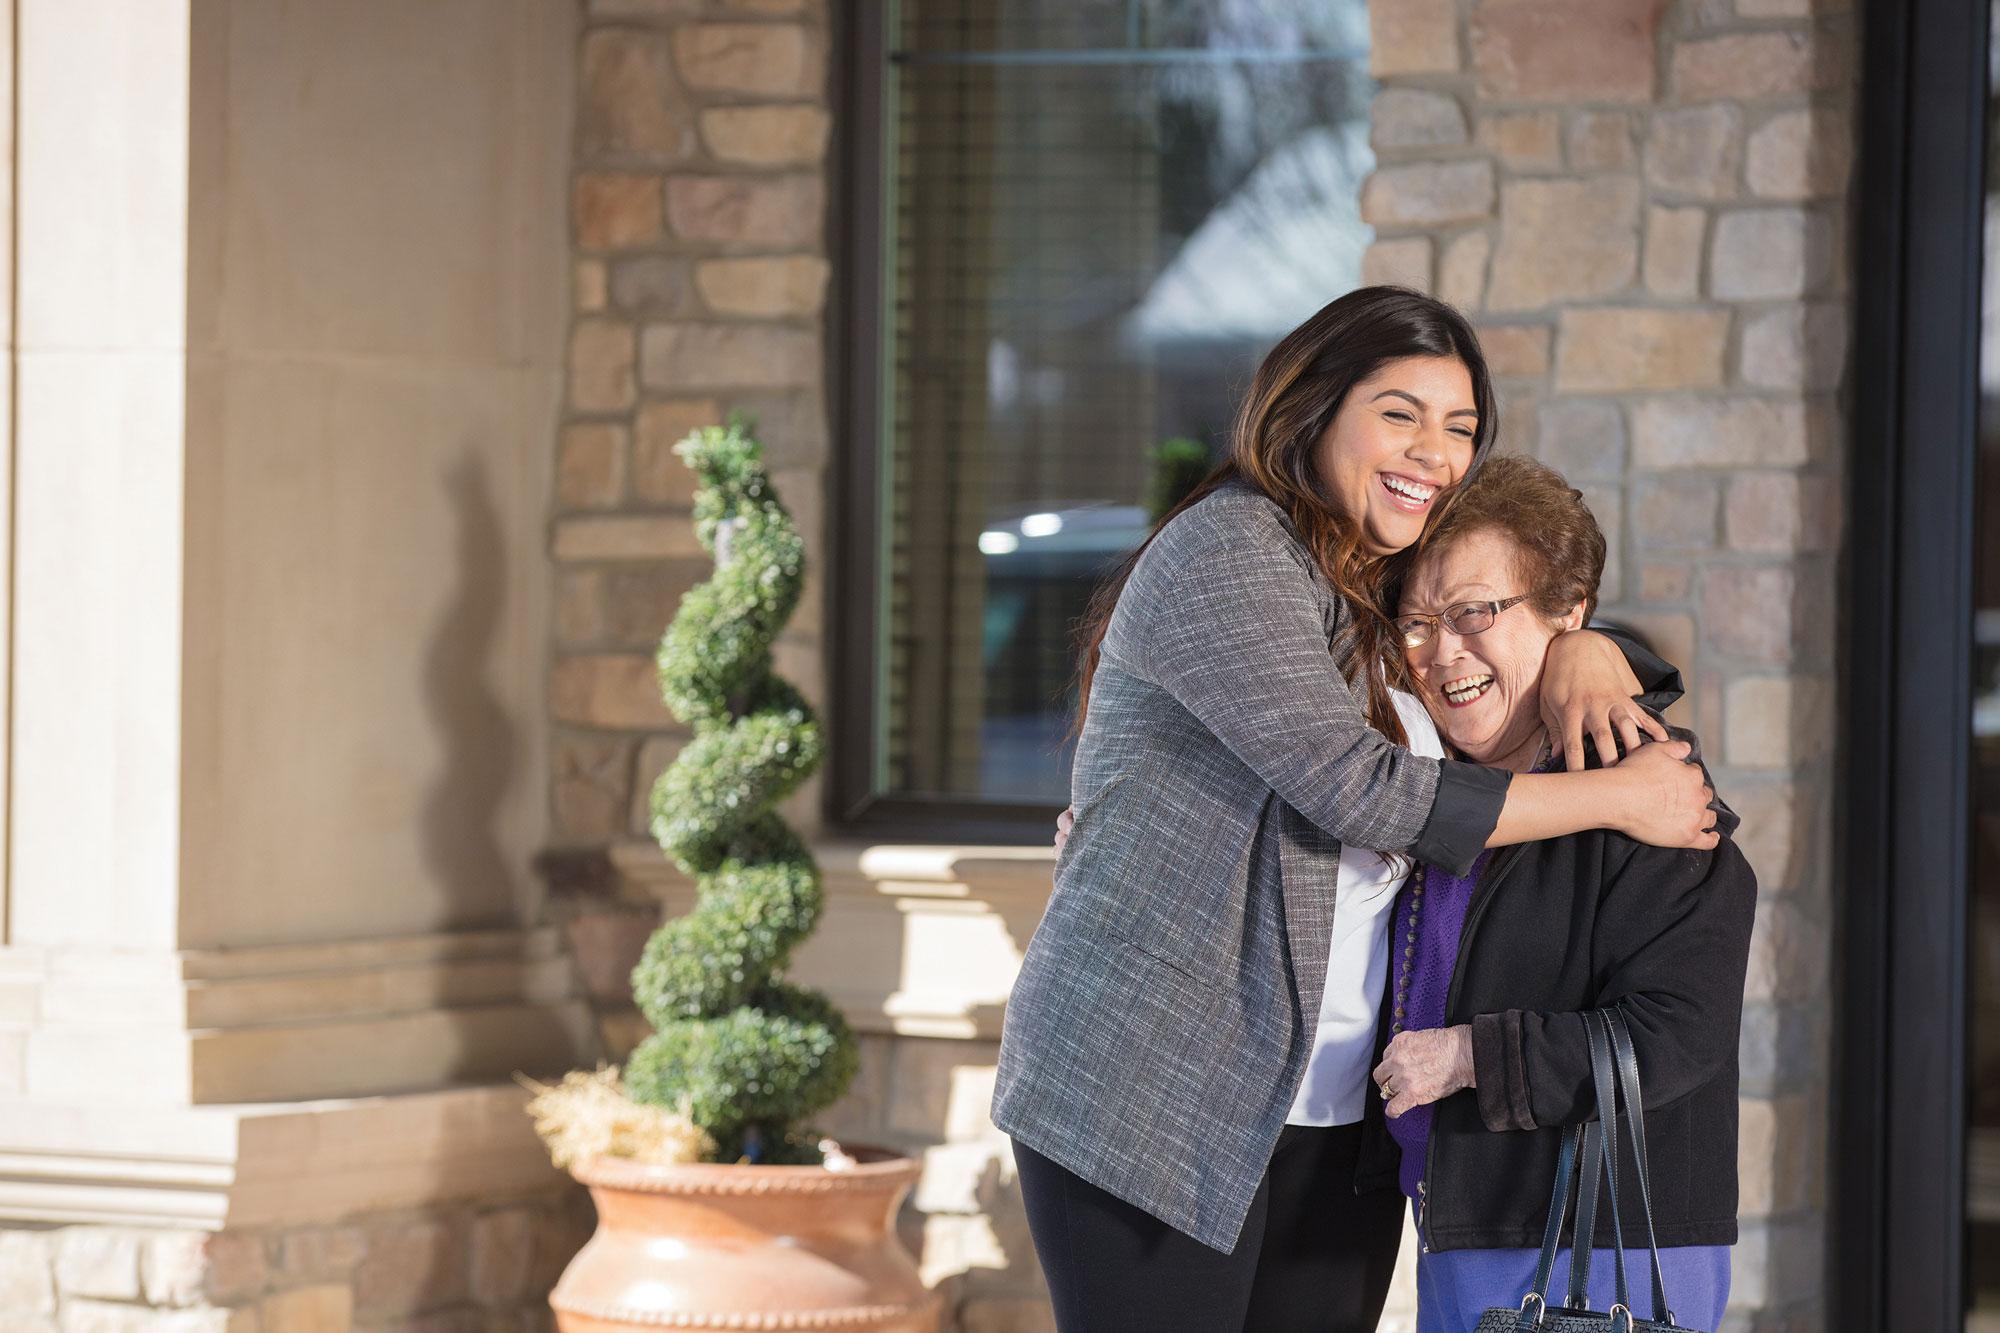 A senior living staff member hugs a senior woman